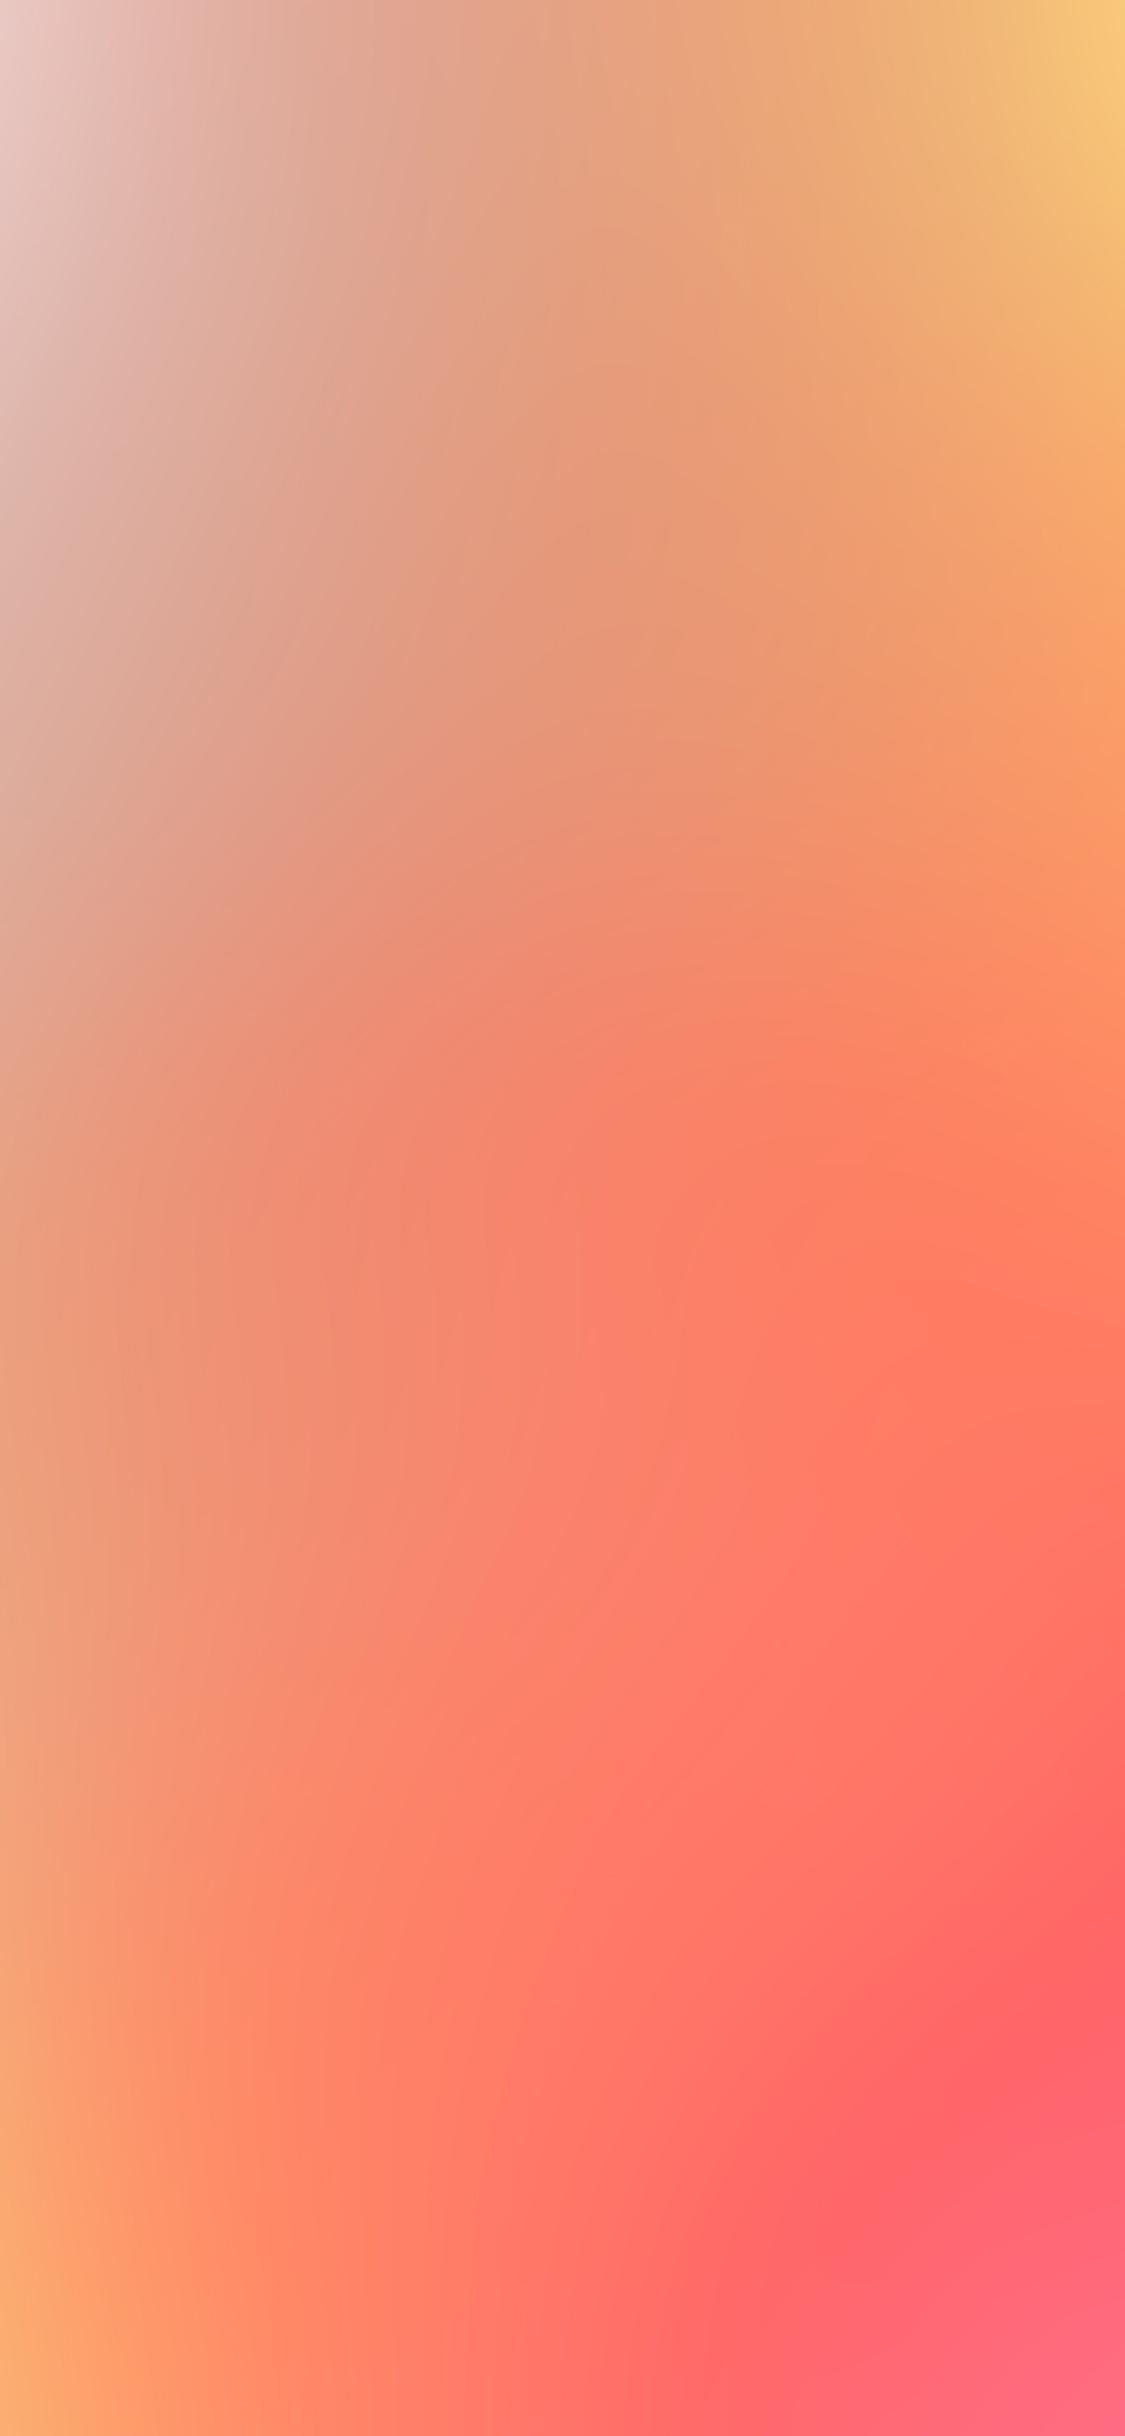 iPhoneXpapers.com-Apple-iPhone-wallpaper-sl61-pink-yellow-blur-gradation